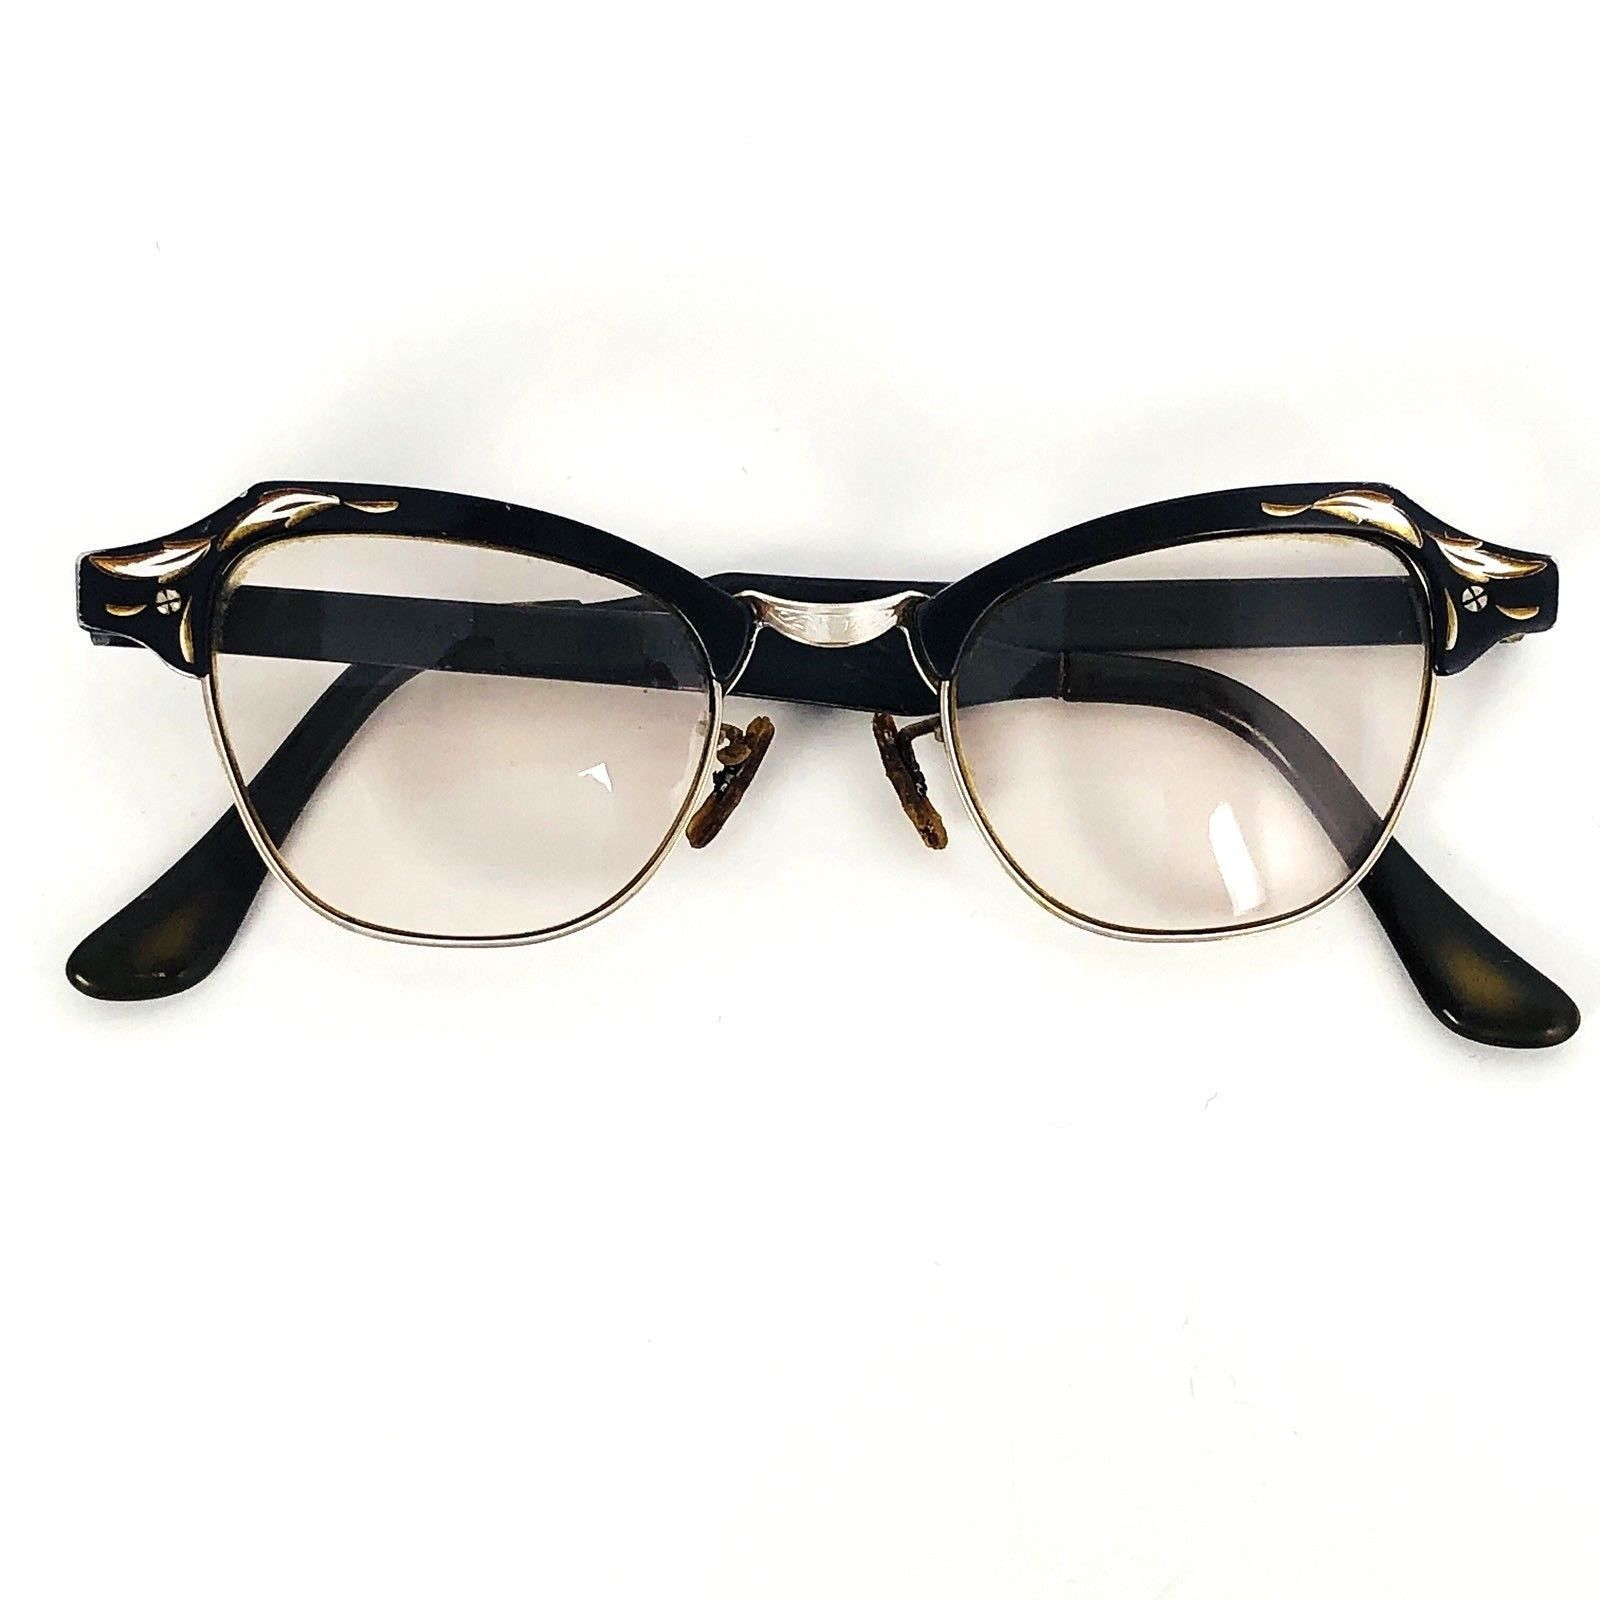 "62e14293e3 Eyeglasses Women s B L Small Frame 4 1 4"" 5 and 50 similar items"